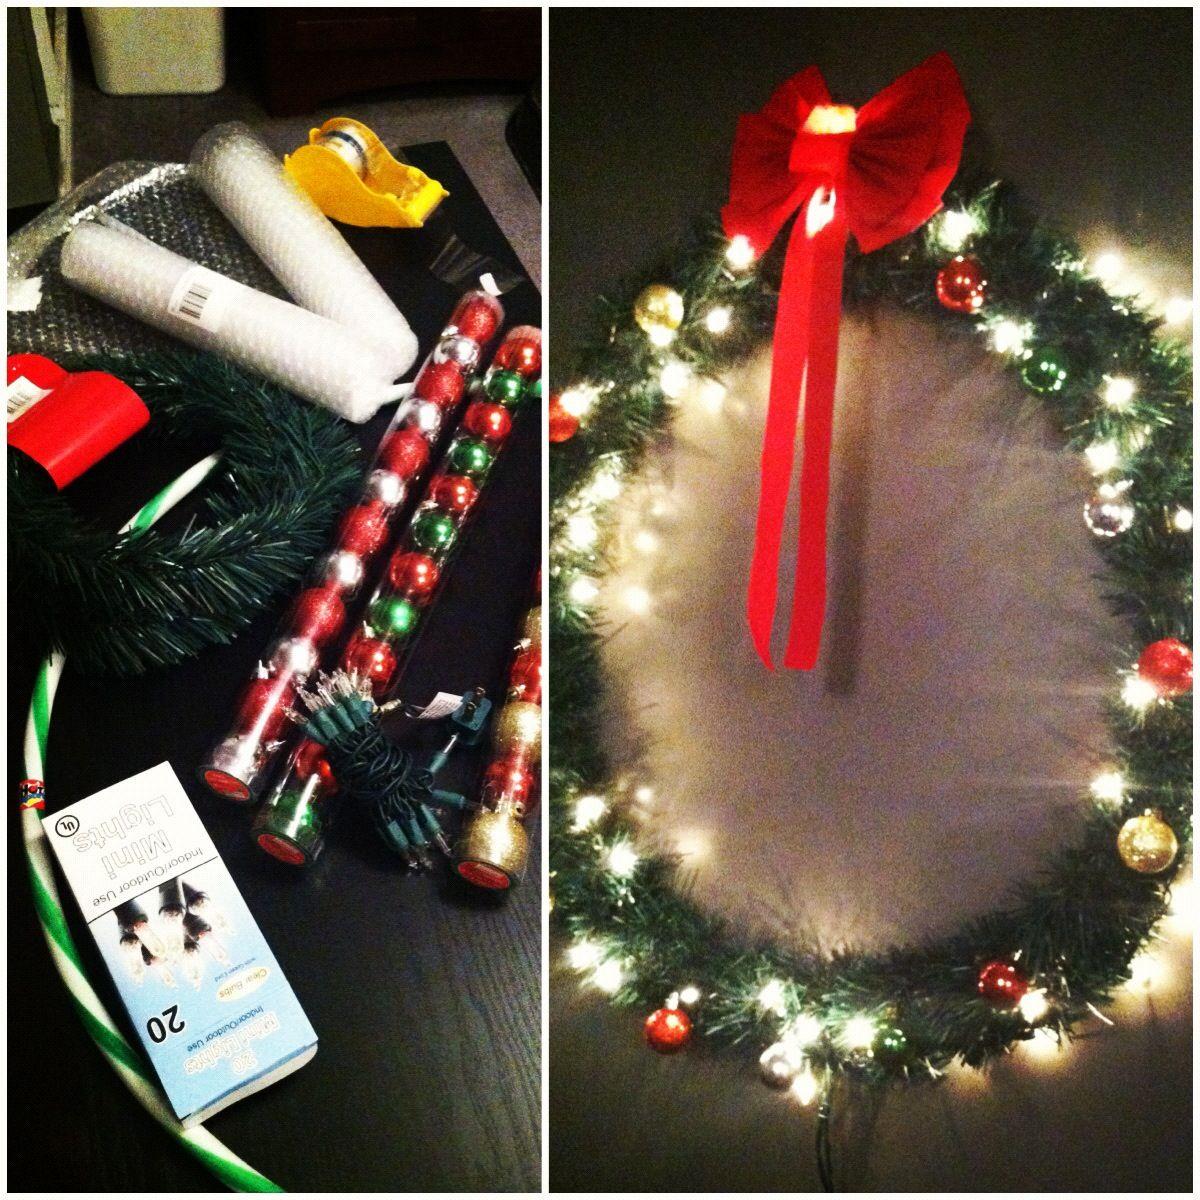 Dollar Store Christmas Wreath: SUPPLIES 1 Hula Hoop. 3